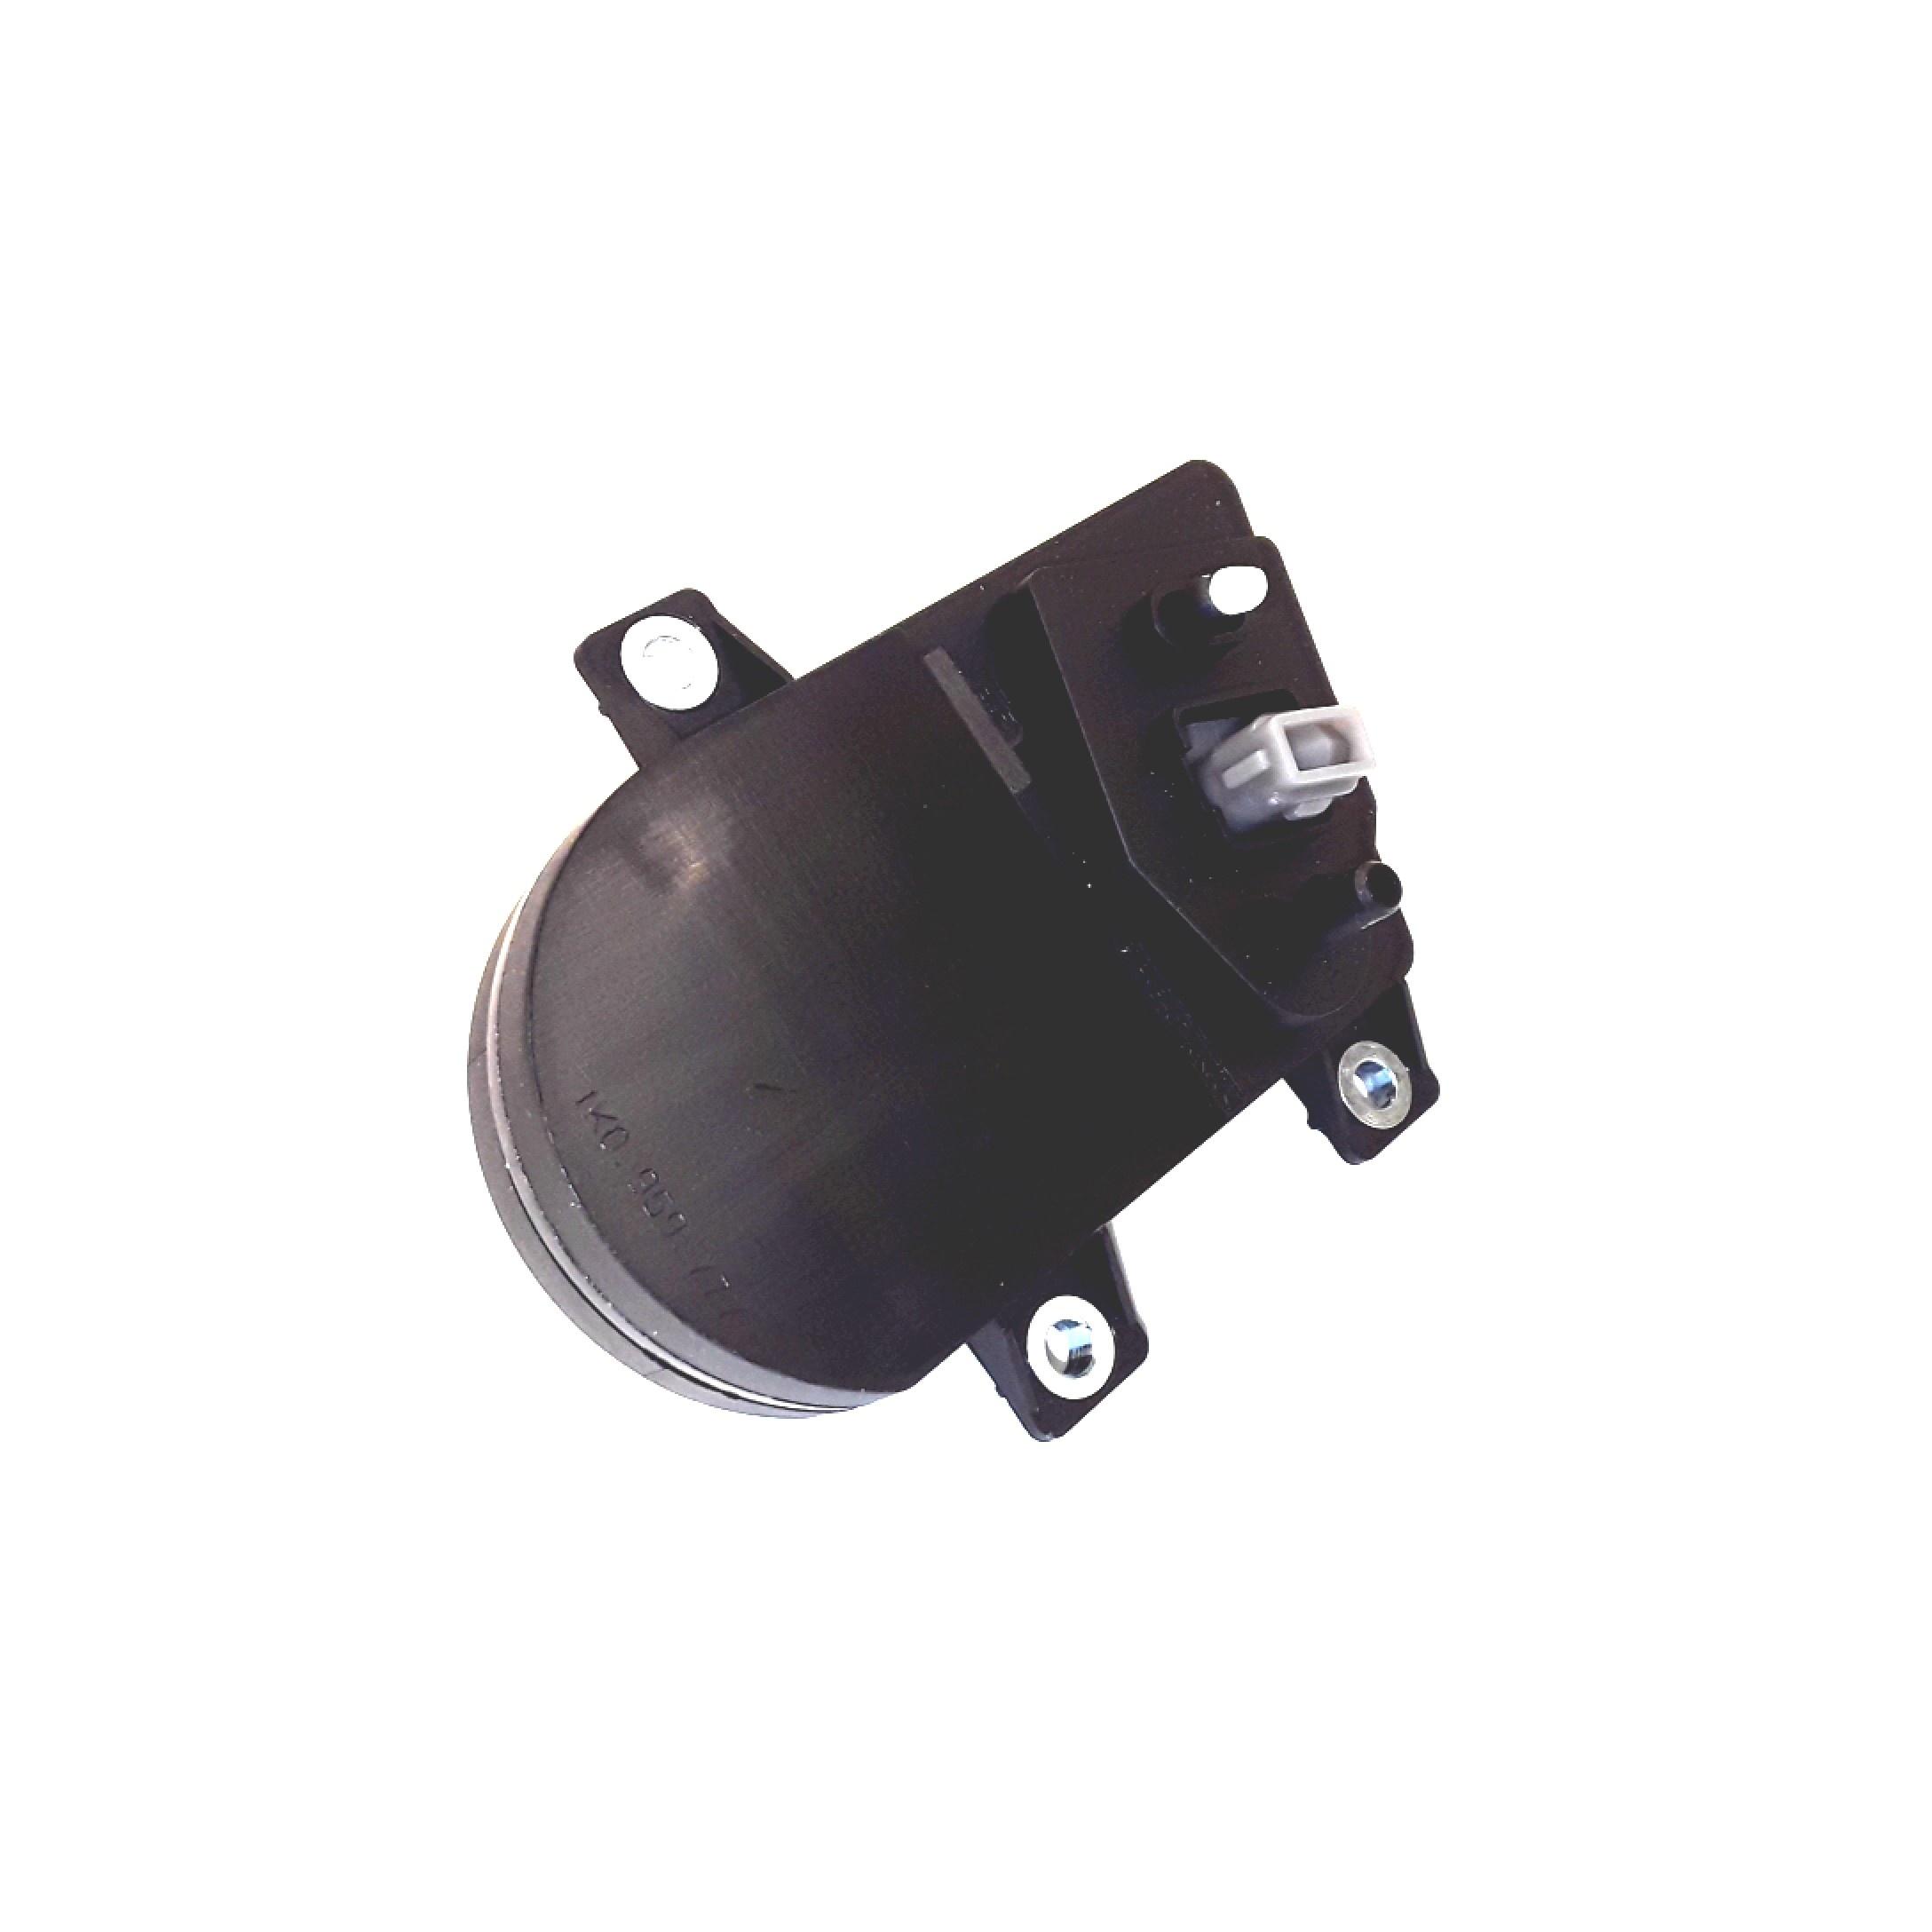 1k09597779b9 Volkswagen Vw Satin Black Seat Adjustment